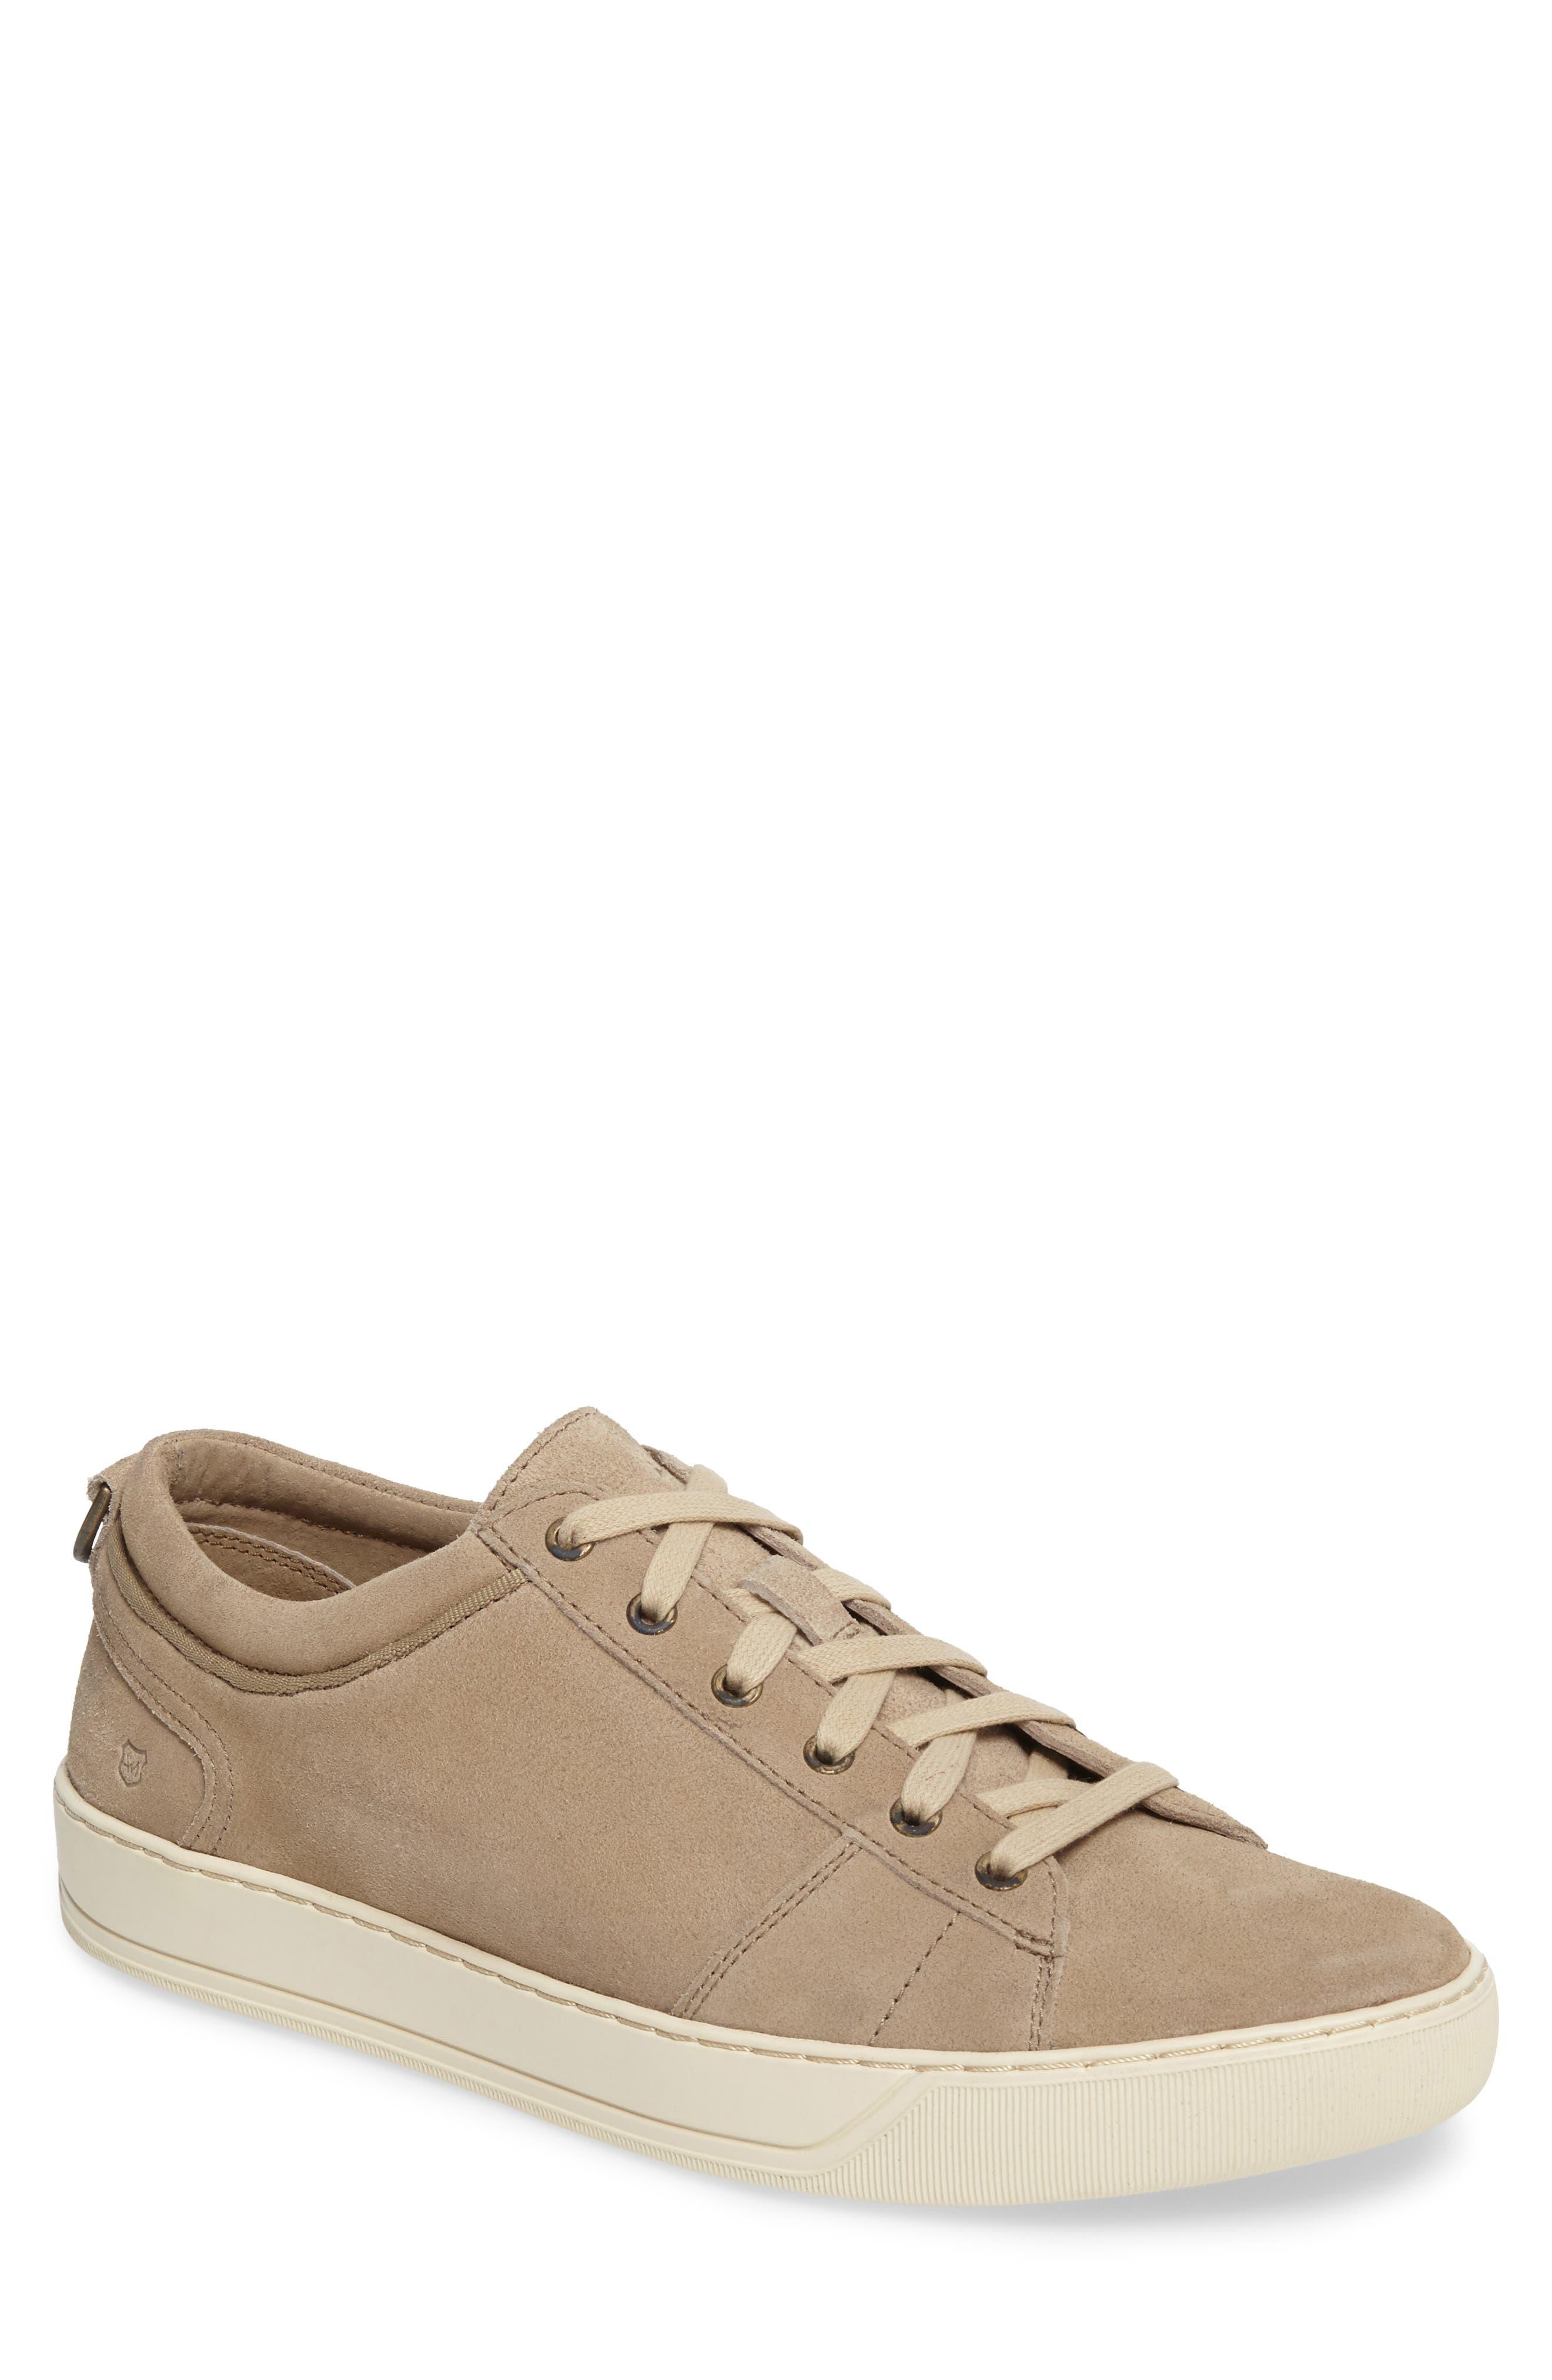 'Darwood' Sneaker,                         Main,                         color, Hemp/ Bone Suede